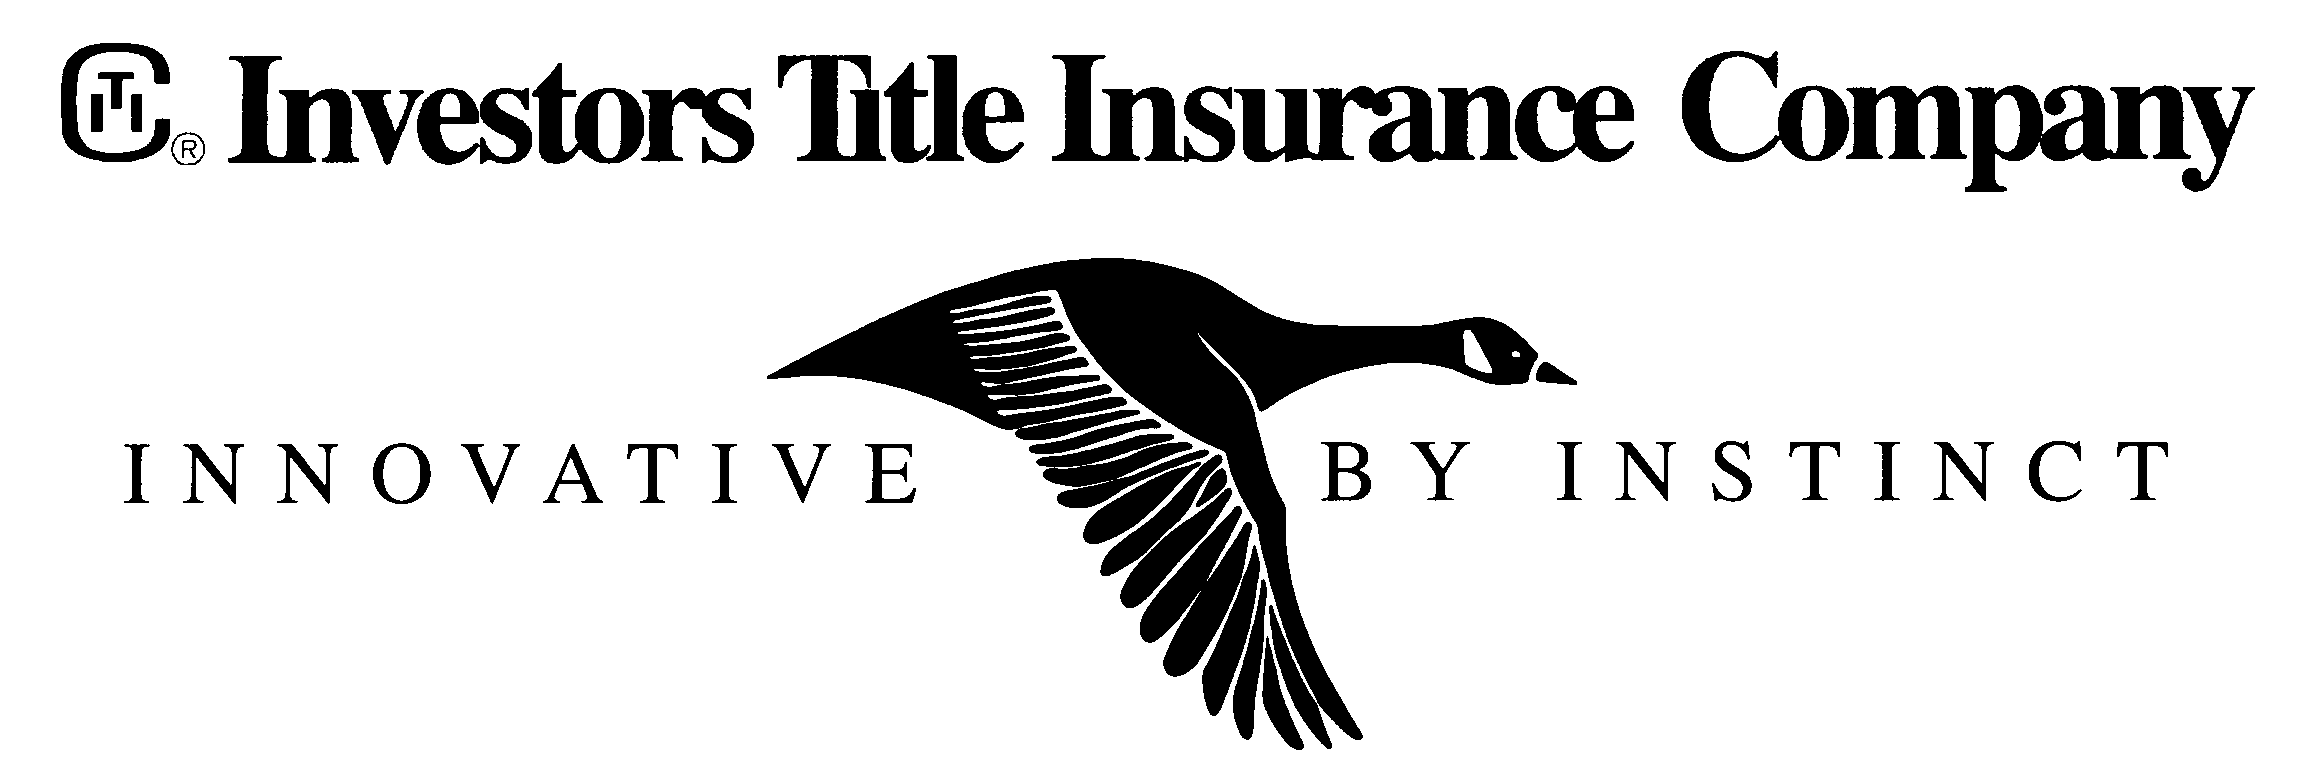 Investors Title Company « Logos & Brands Directory